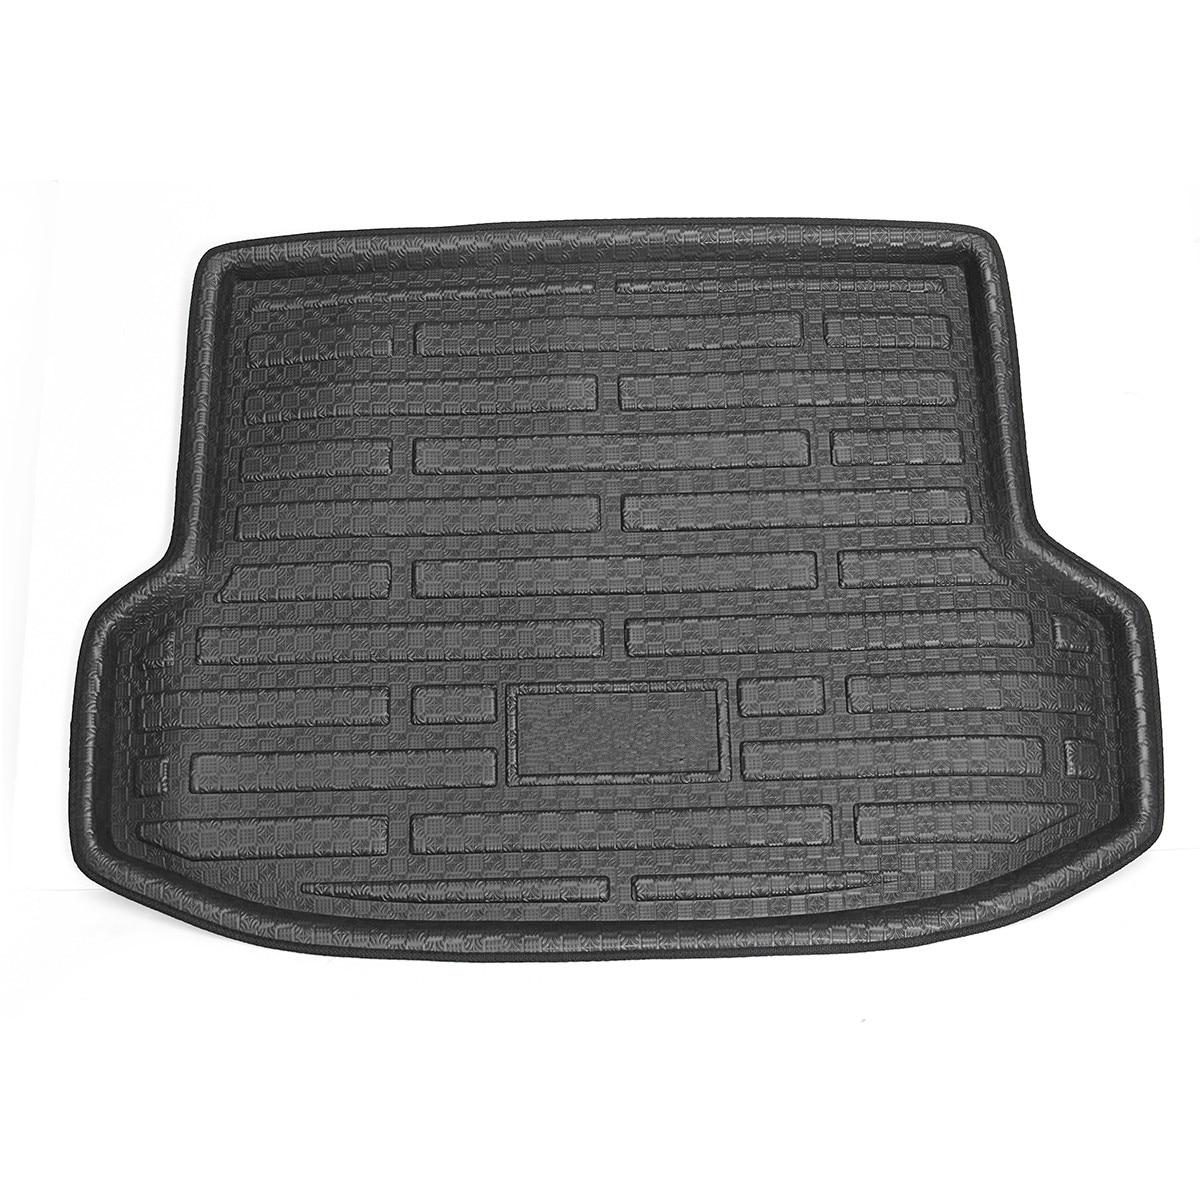 For Hyundai Tucson IX35 2010 2011 2012 2013 2014 2015 Car Rear Boot Liner Trunk Cargo Mat Tray Floor Carpet Mud Pad Protector|  - title=